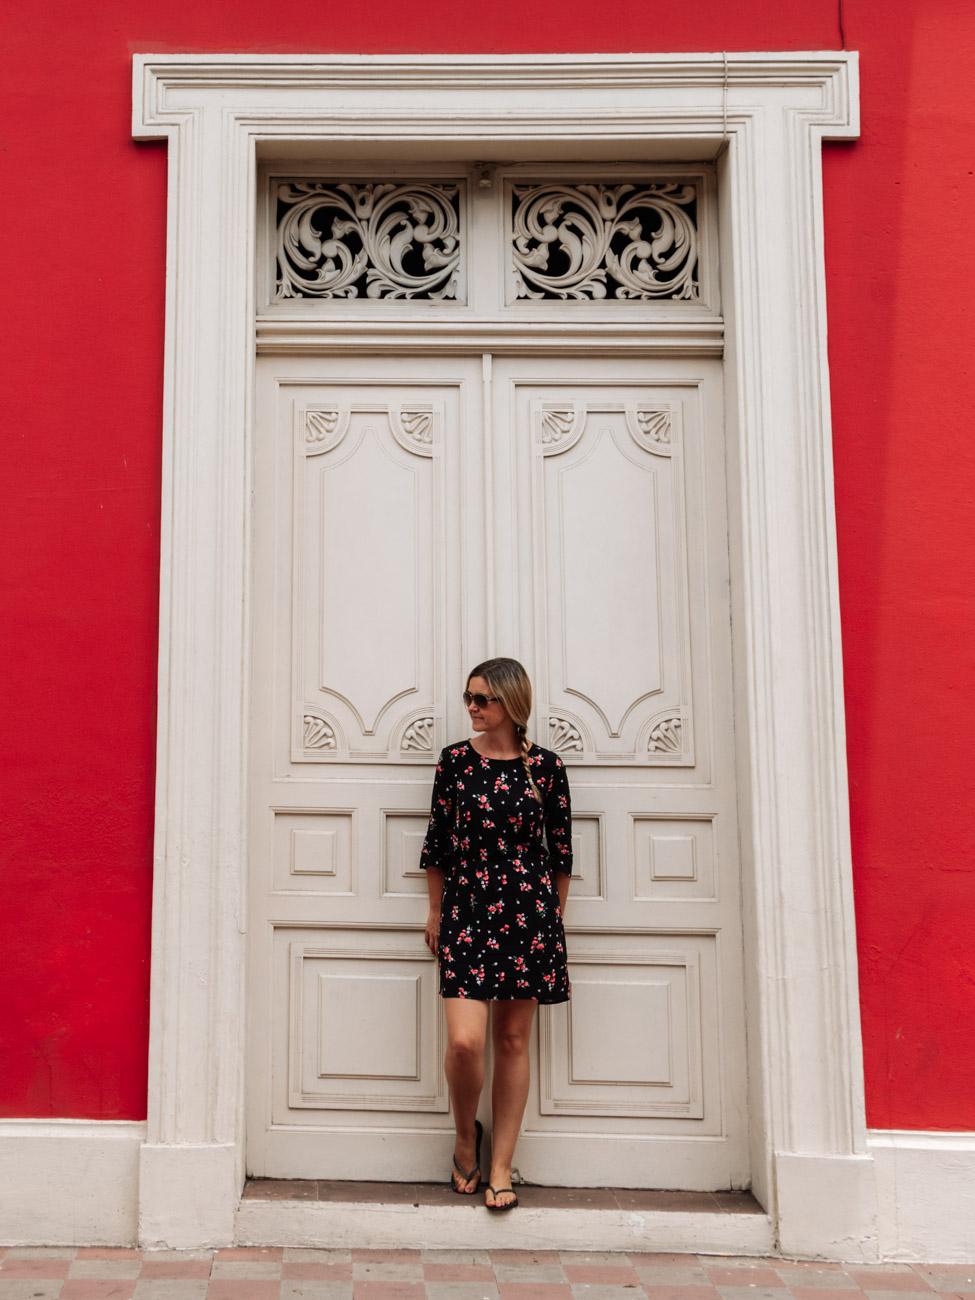 Colourful Granada street - Nicaragua